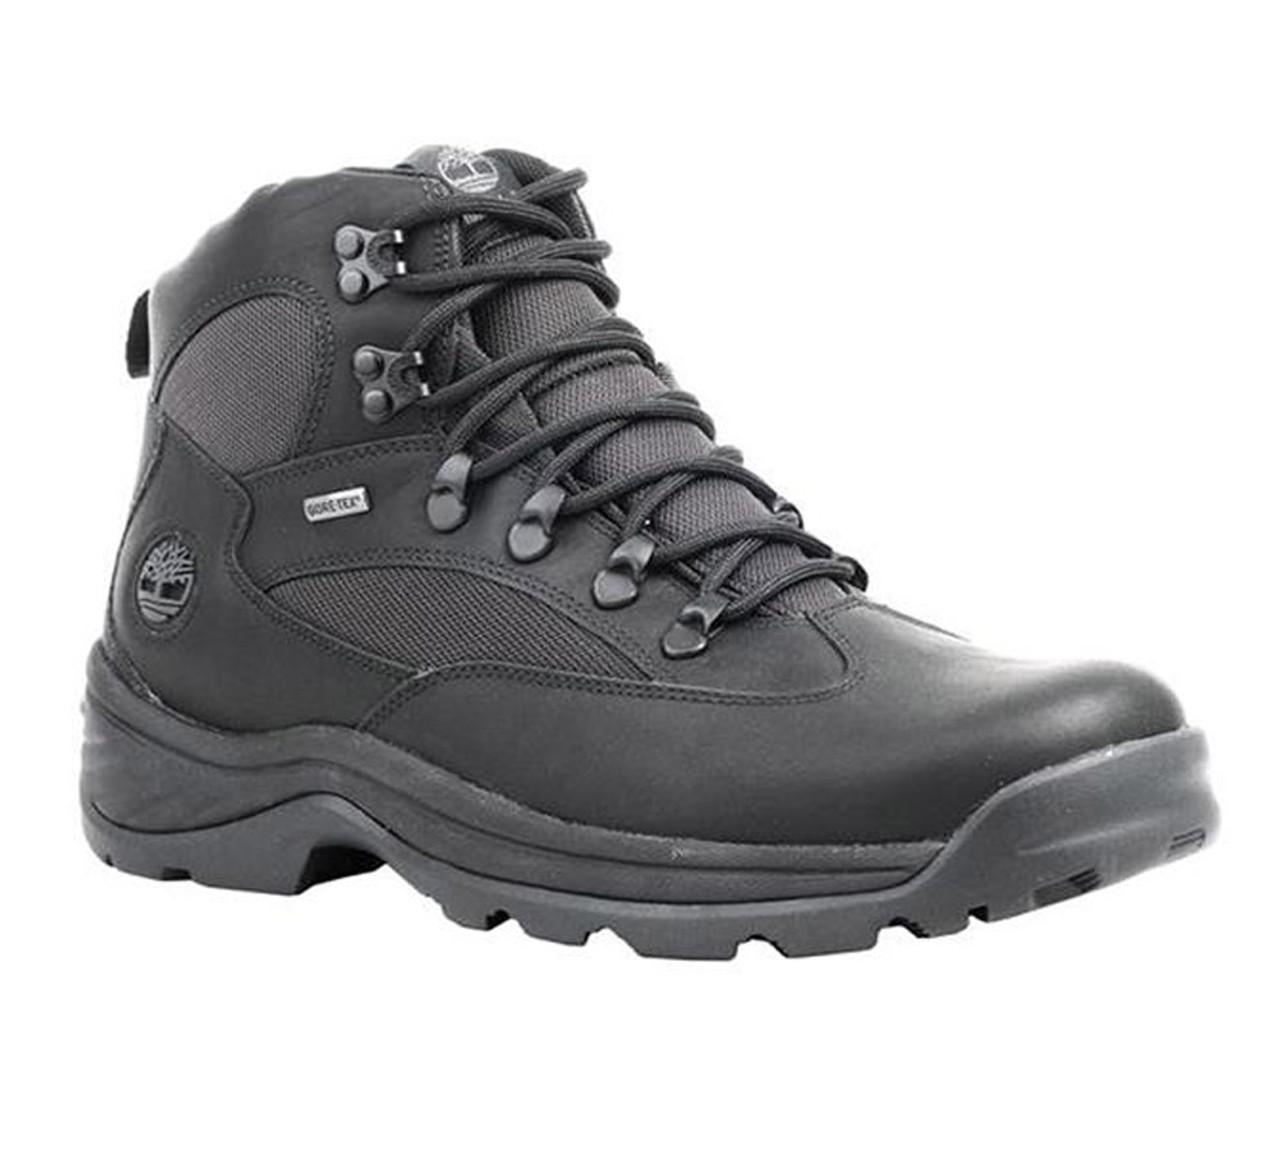 Fiesta dinosaurio Riego  Timberland Men's Chocorua Trail Gore-Tex Mid Hiking Boot - Black   Discount  Timberland Mens Outdoor Shoes & More - Shoolu.com   Shoolu.com